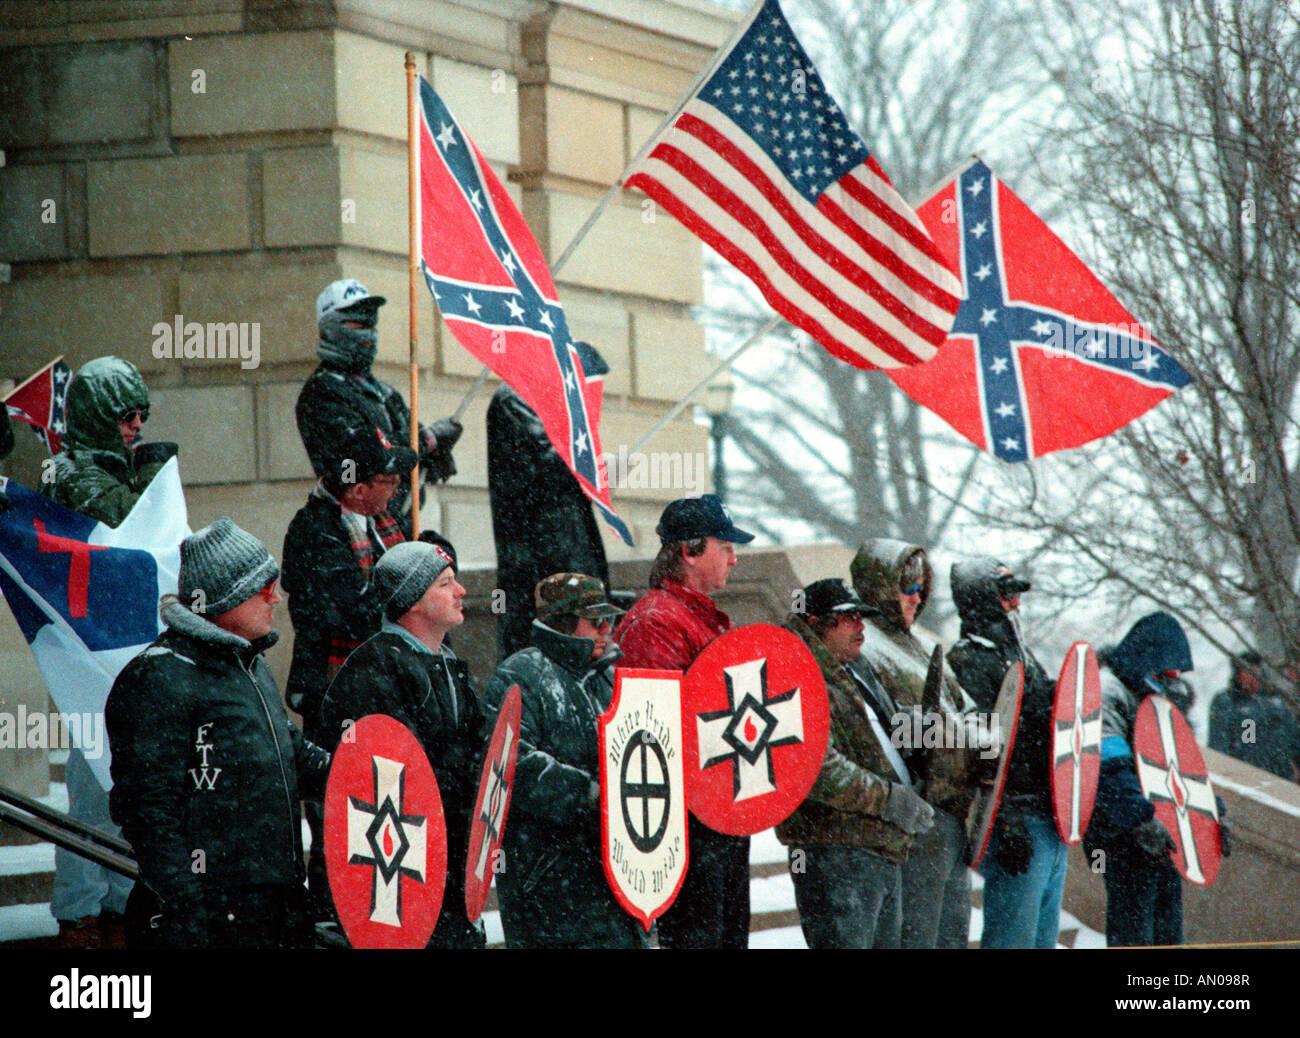 USA, Illinois, White Supremacist Ku Klux Klan rally on steps of Illinois state capitol building - Stock Image